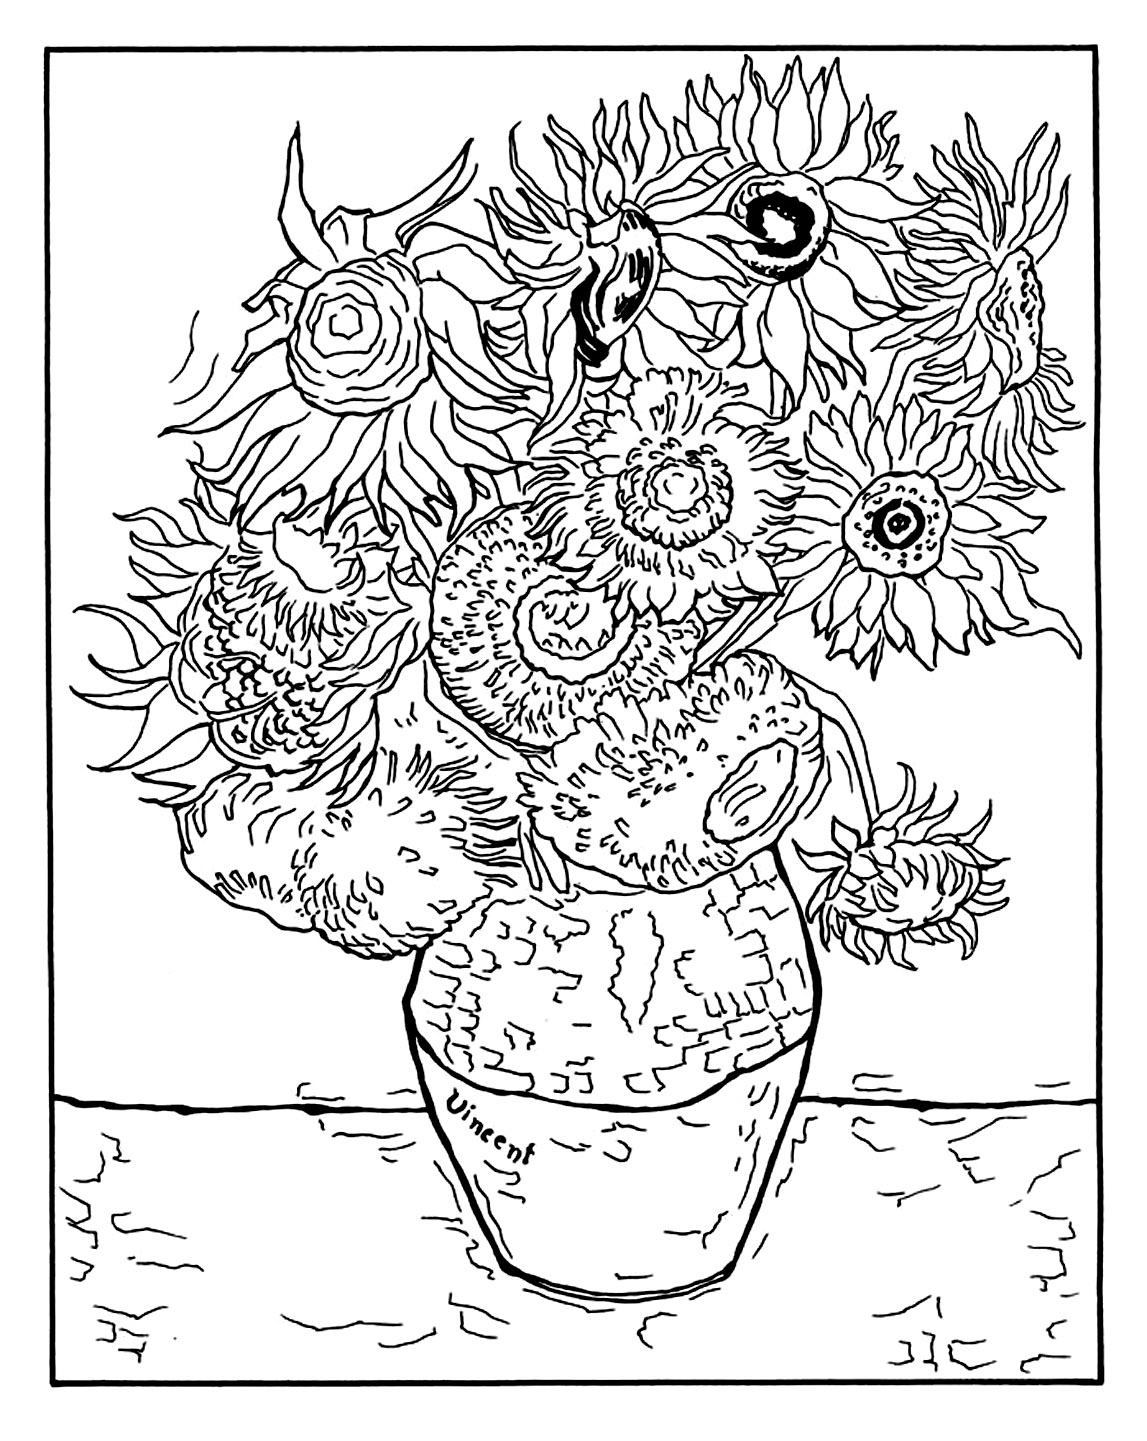 Vincent van gogh 12 tournesols dans un vase